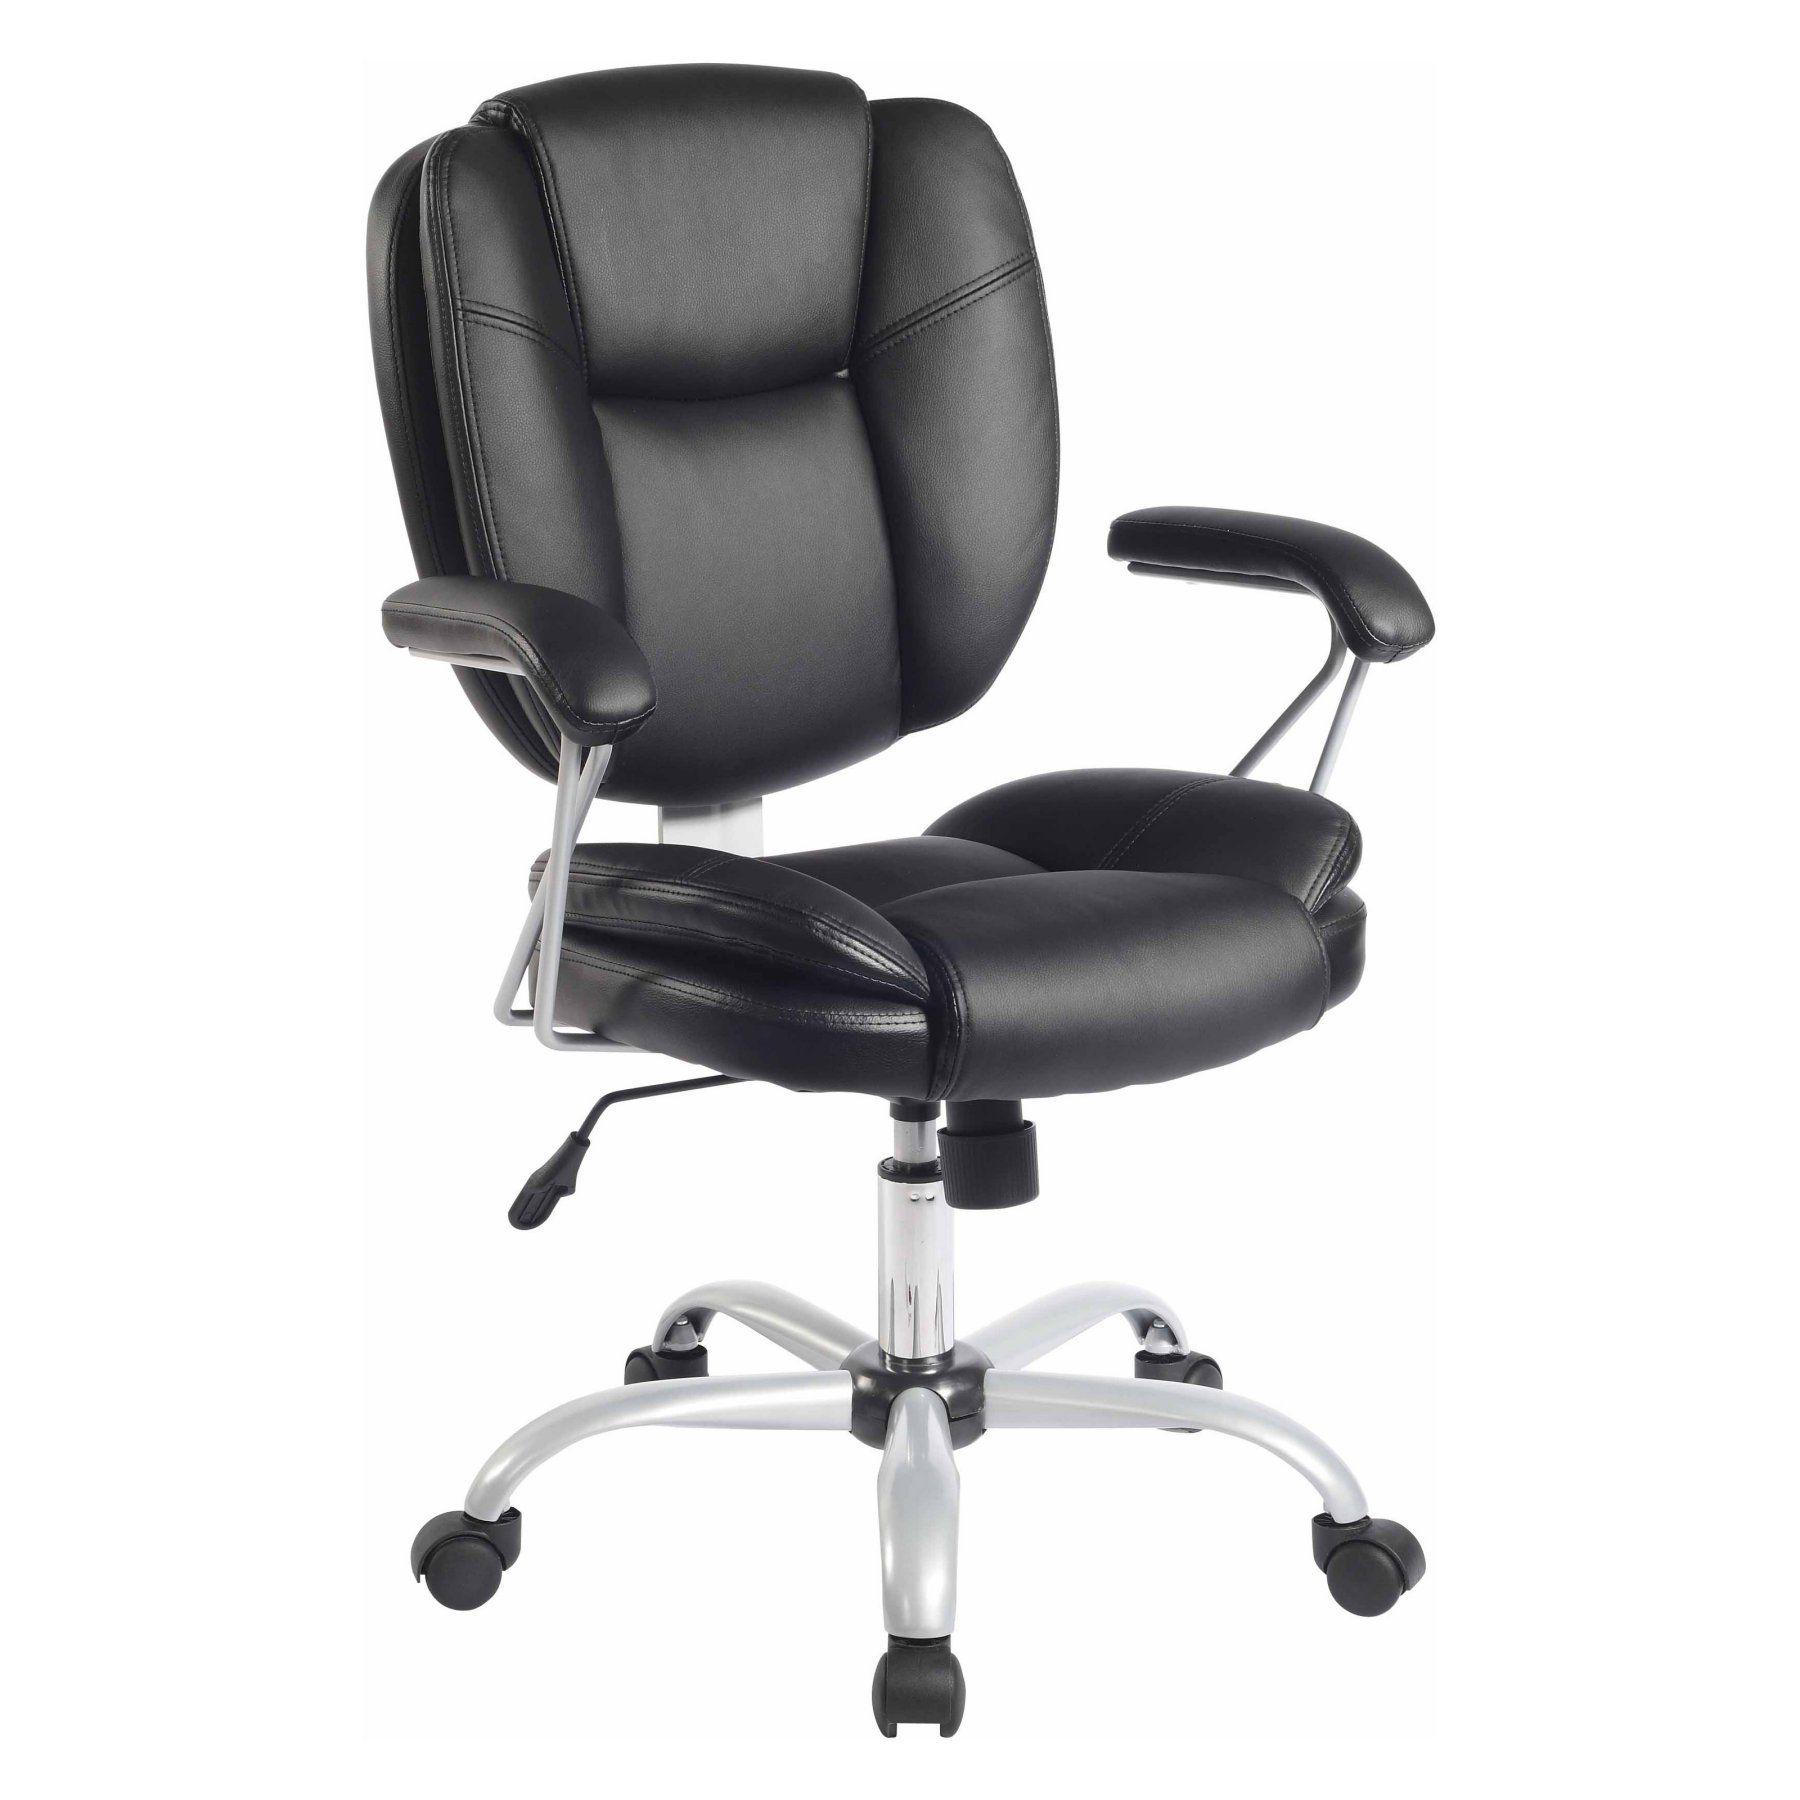 Techni Mobili Comfort Techniflex Chair - RTA-0930-BK